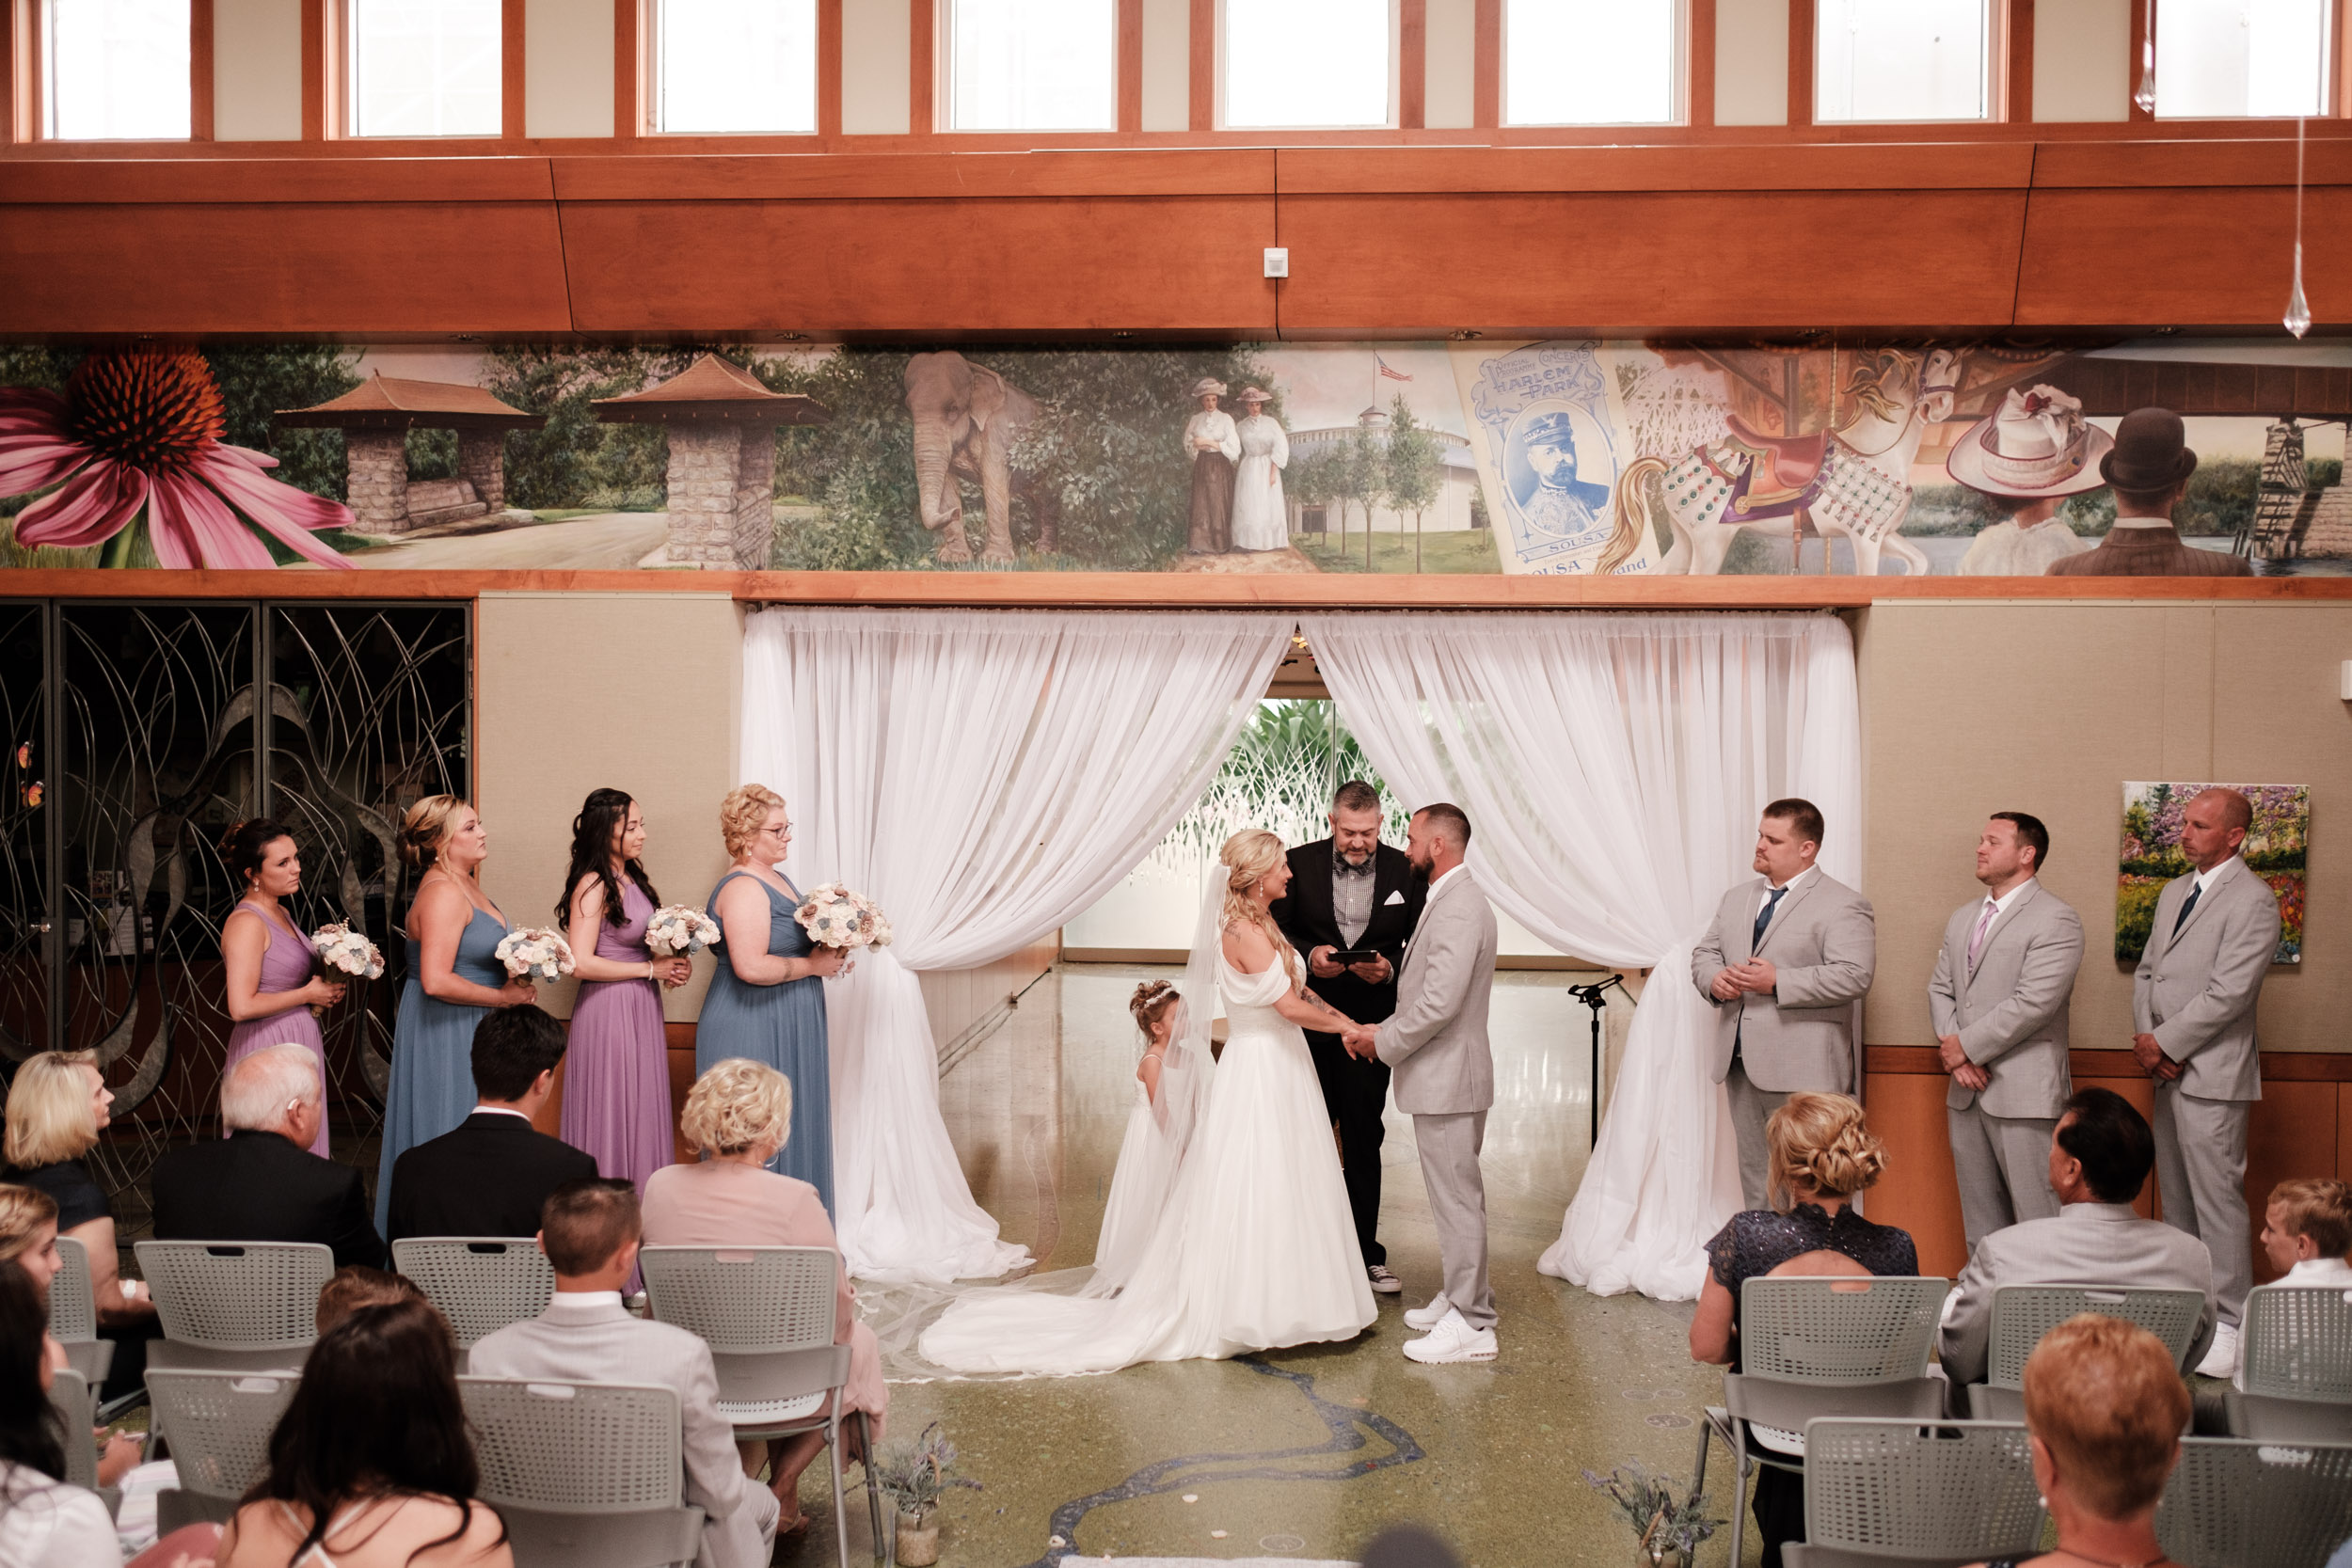 19-06-01 Megan Josh - Nicholas Conservatory Wedding-11.jpg